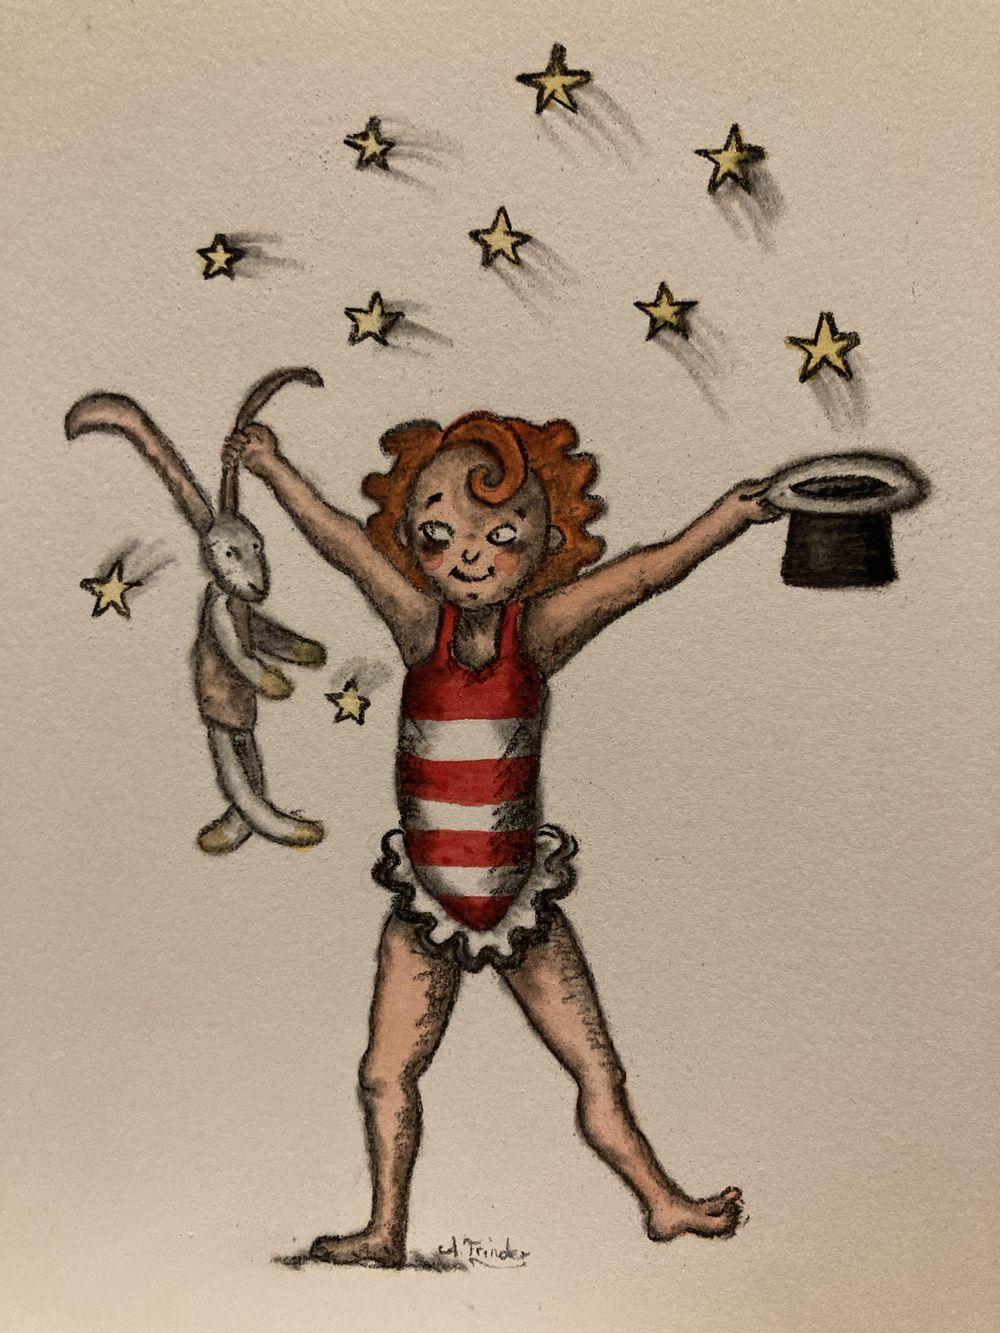 Watercolour magic: circus girl 5 ways! - image 5 - student project